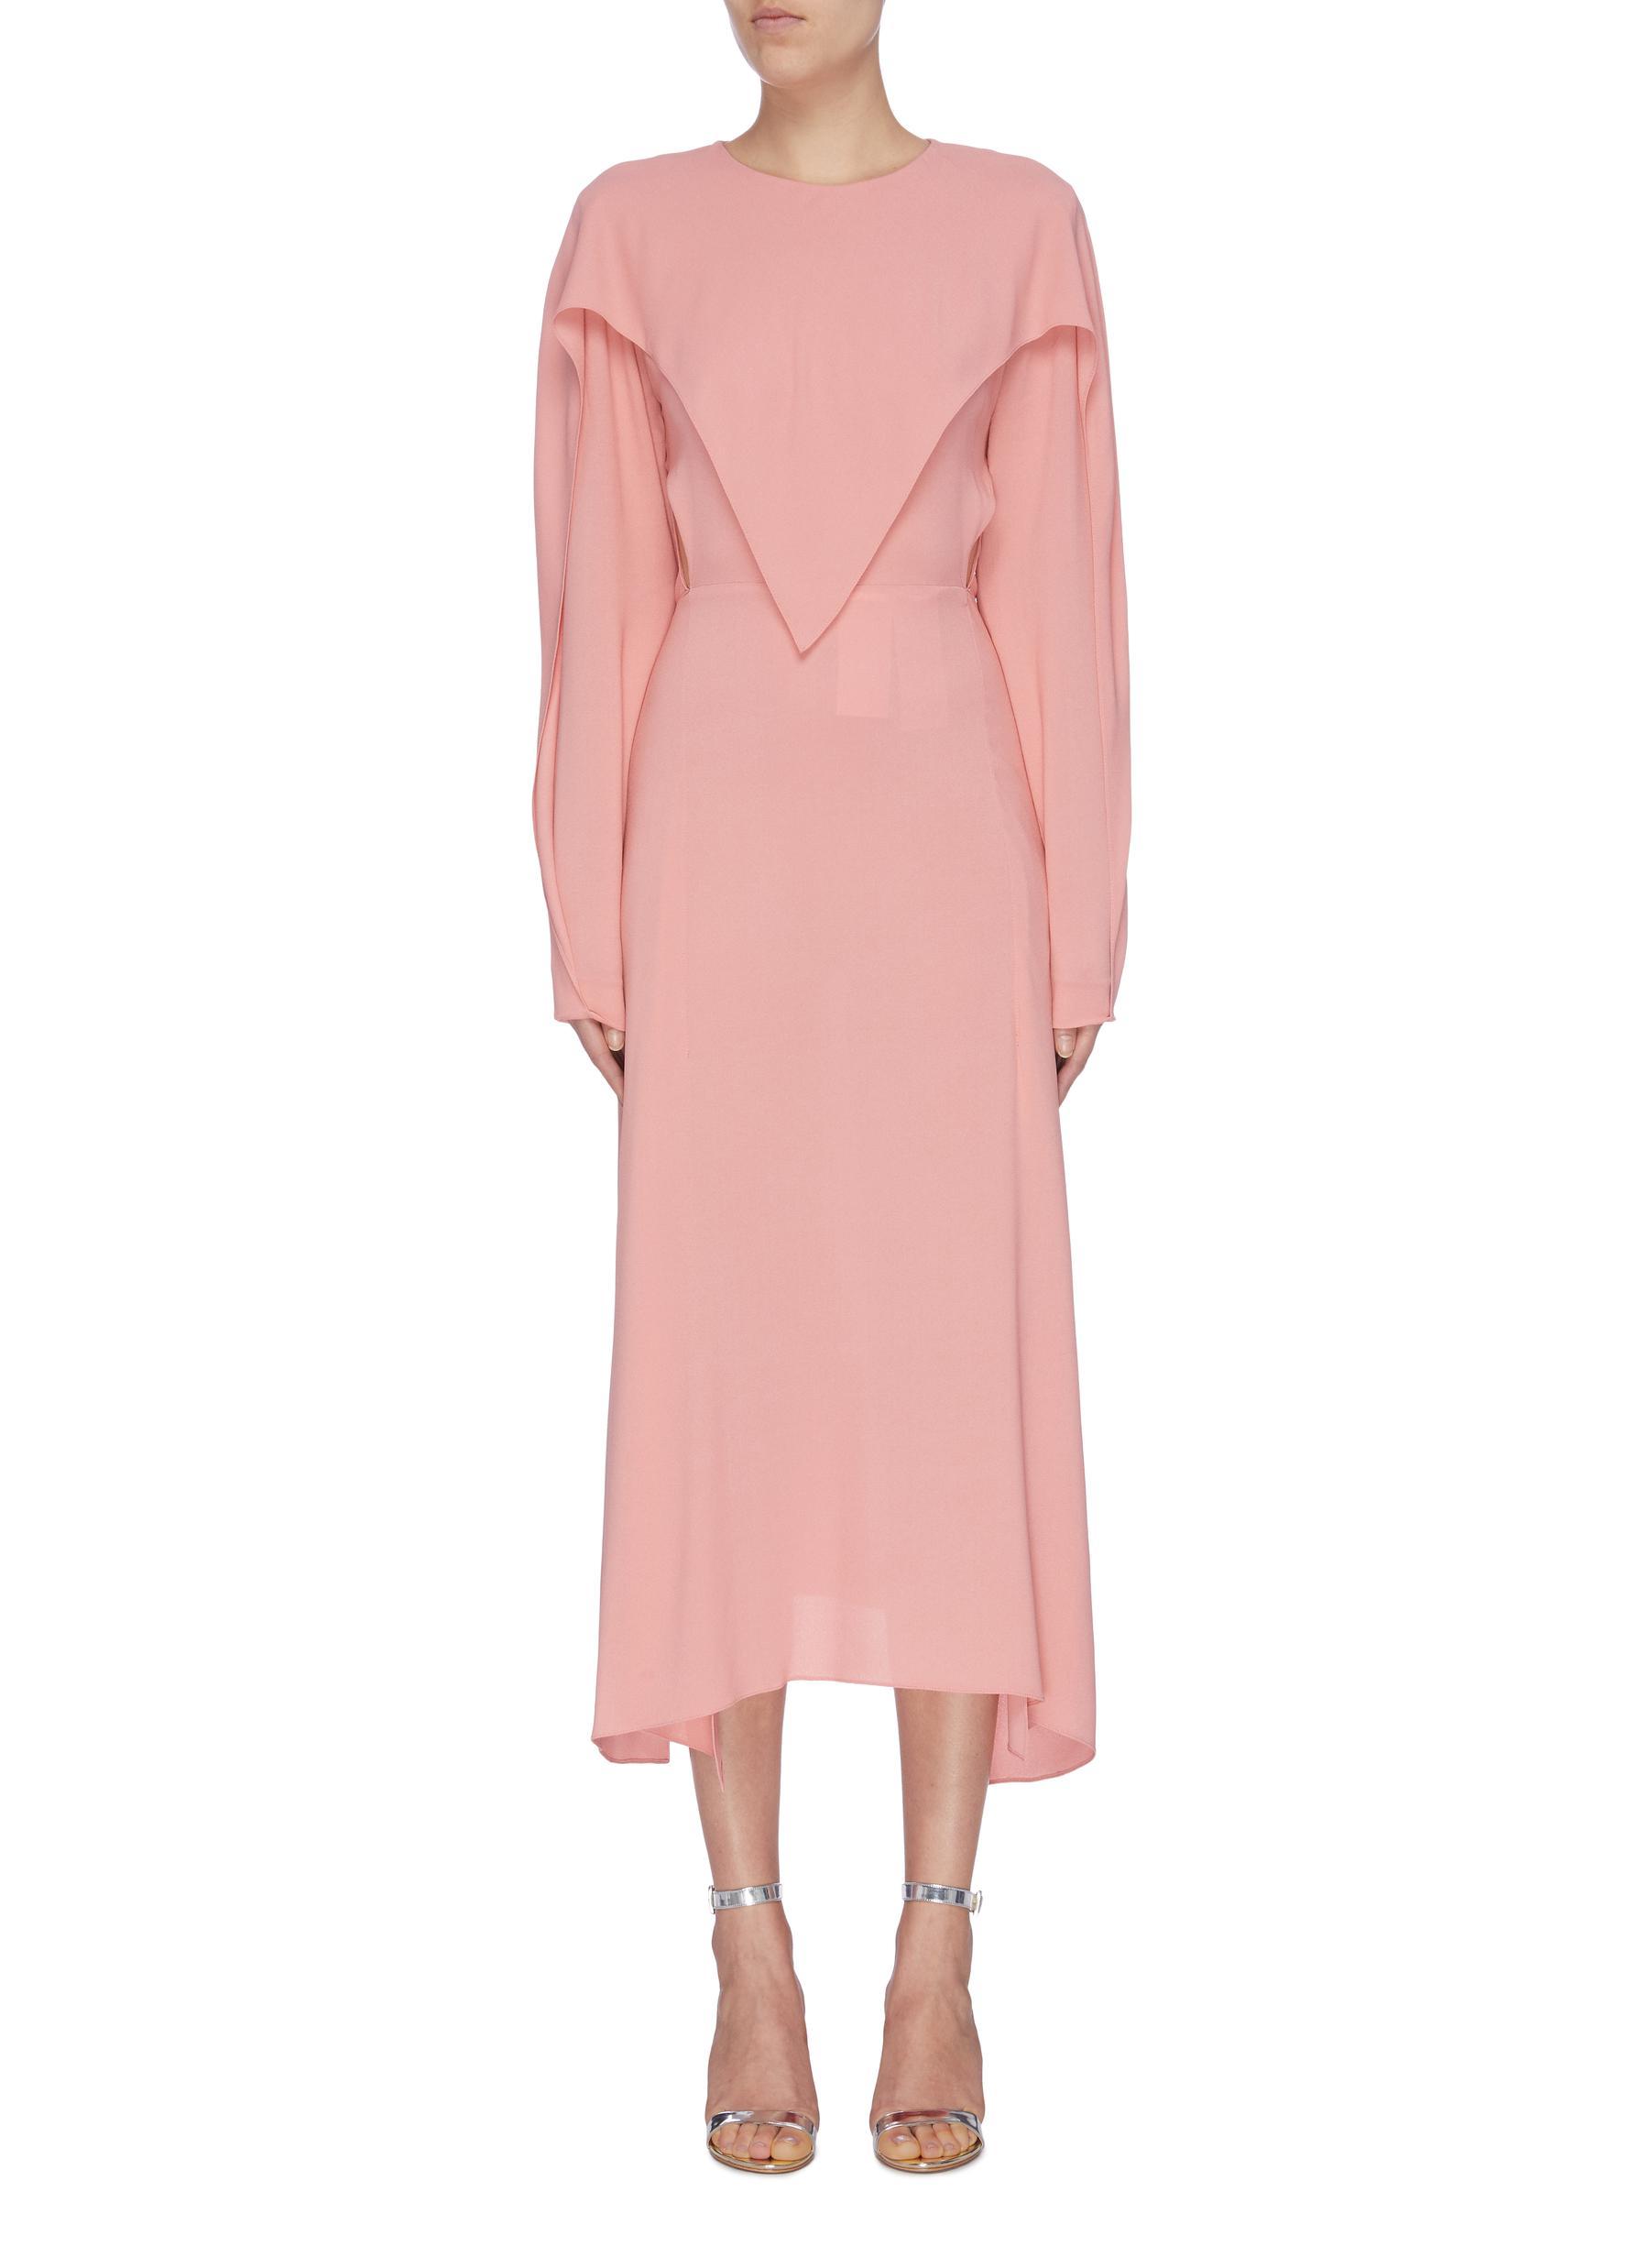 Drape collar panel crepe dress by Stella Mccartney